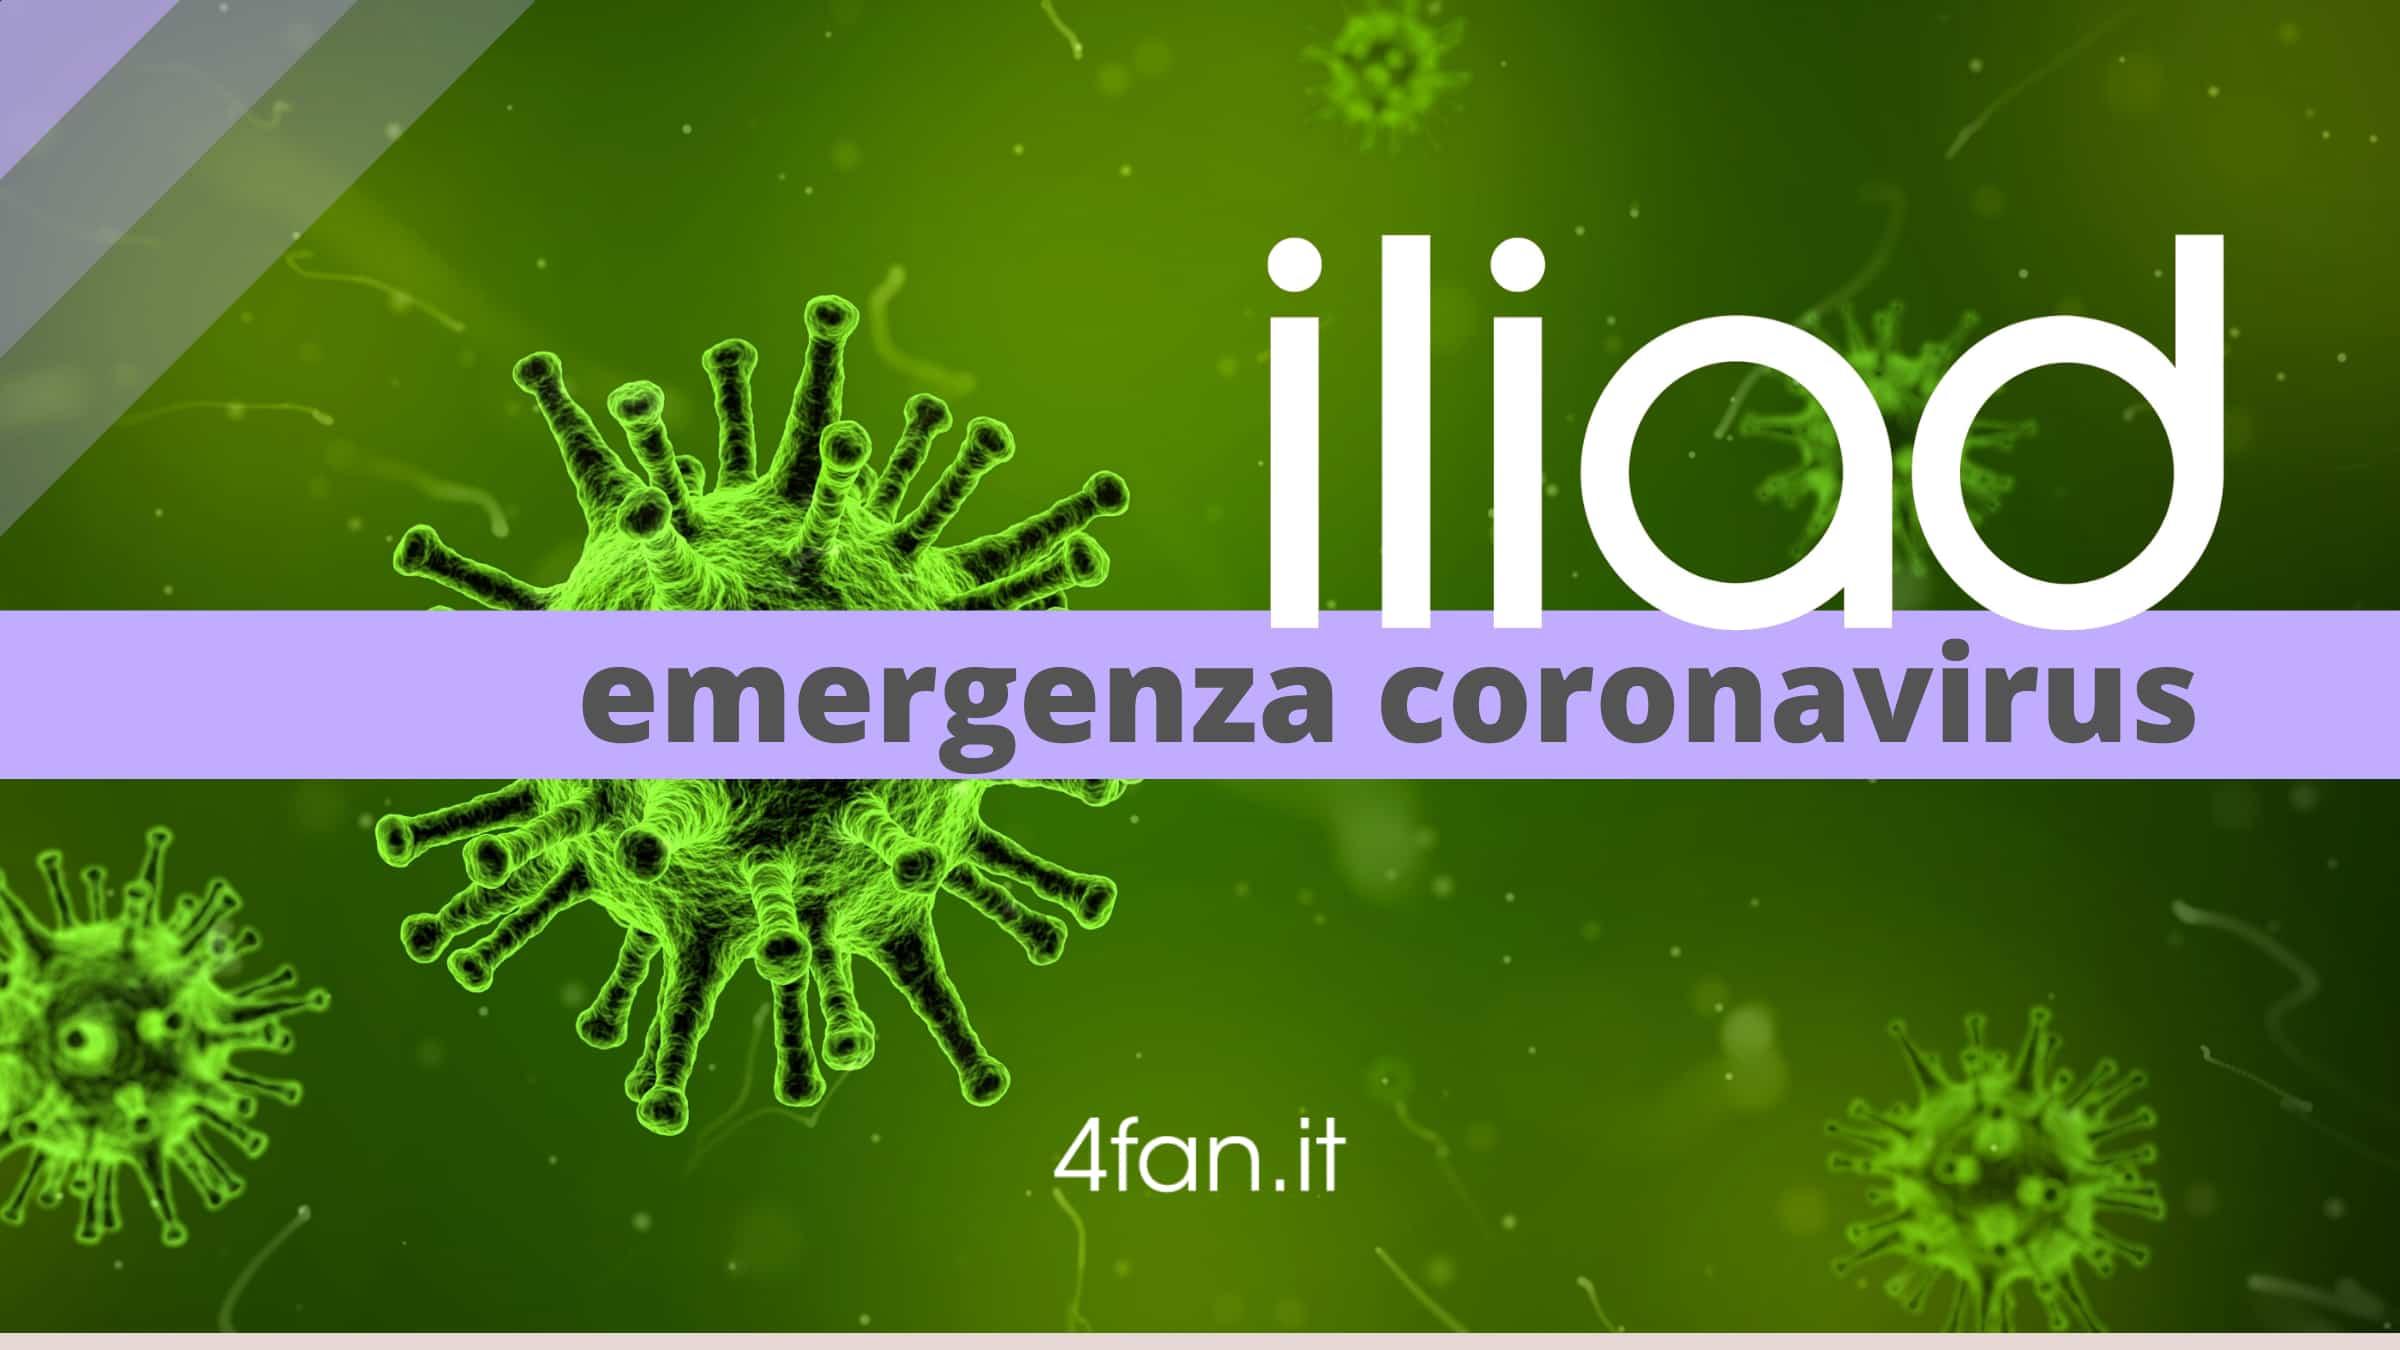 Iliad emergenza coronavirus